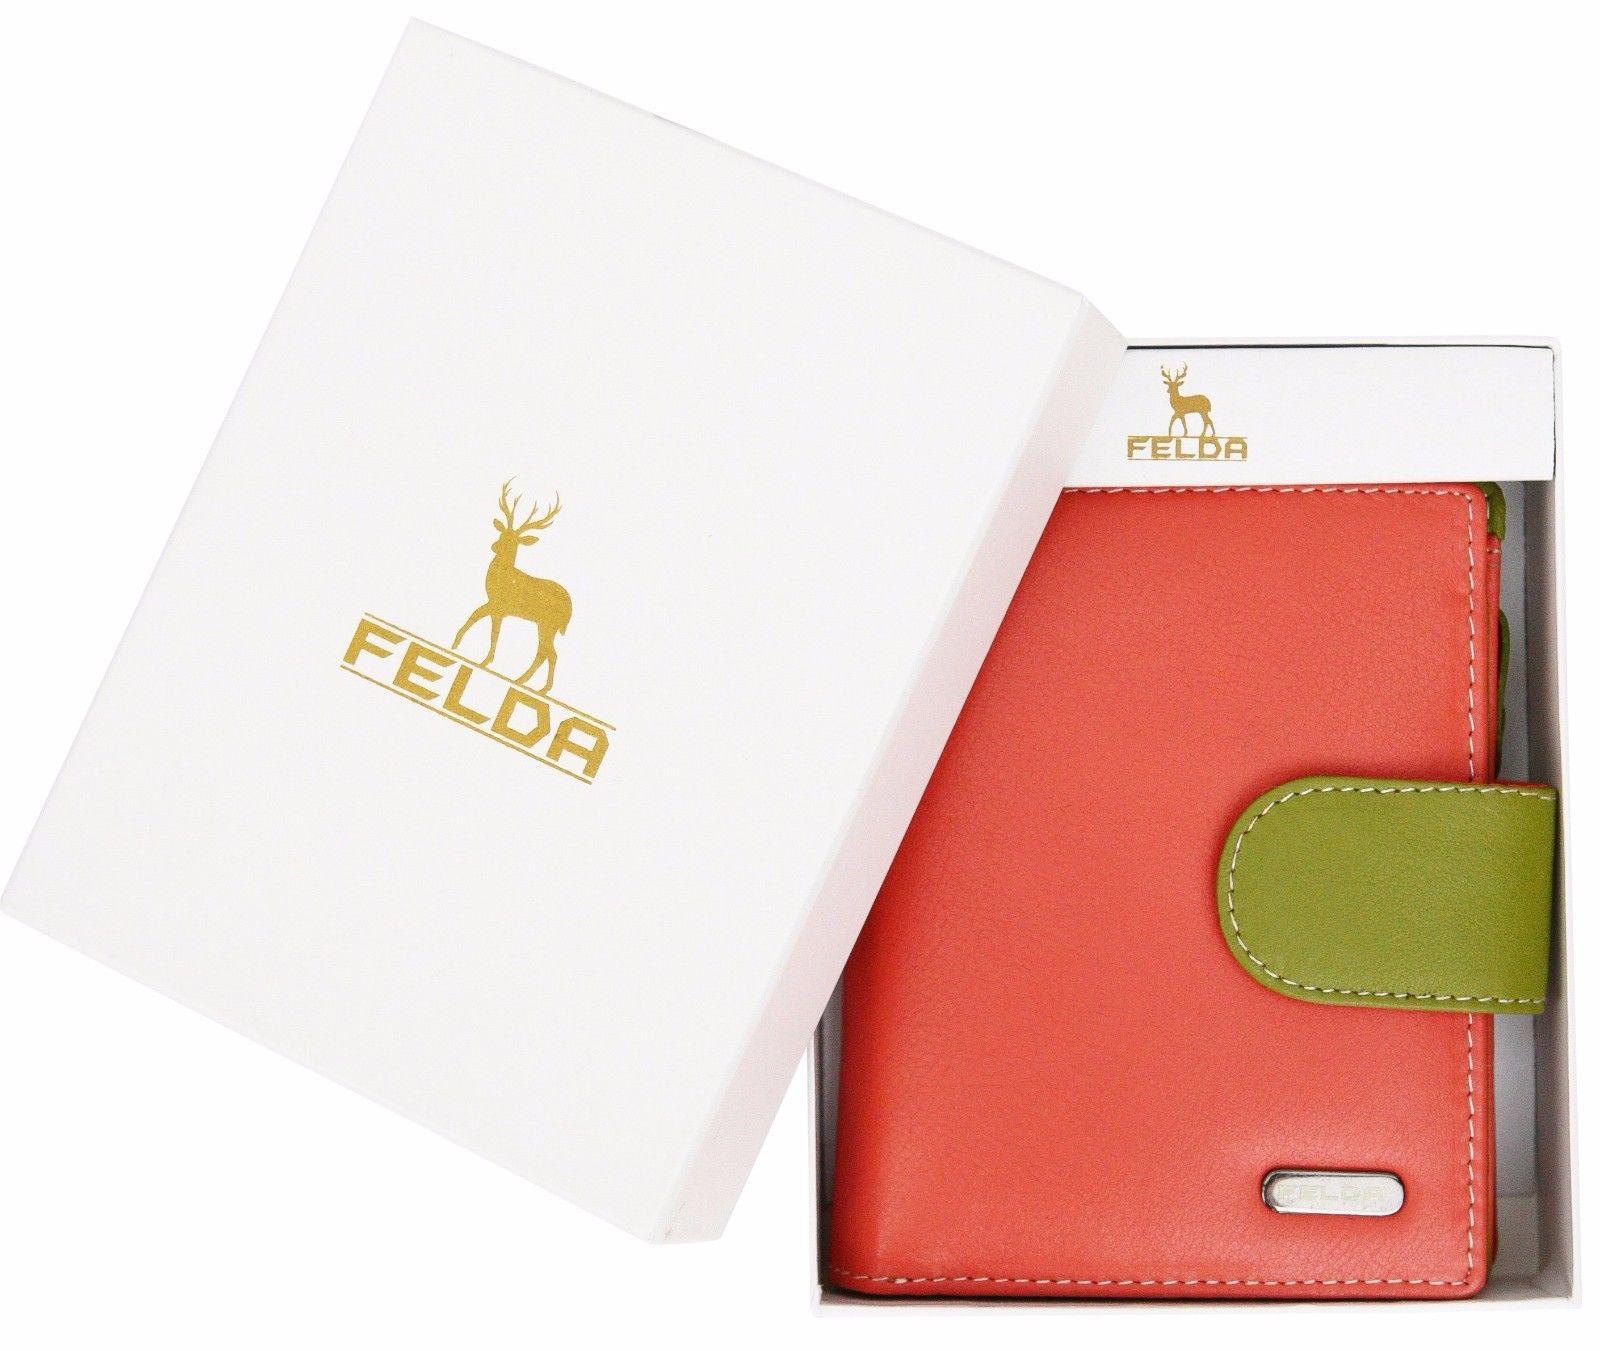 Felda-RFID-onorevoli-MEDAGLIA-amp-Card-Purse-Wallet-Genuine-Leather-Multi-SOFT-BOX-REGALO miniatura 25